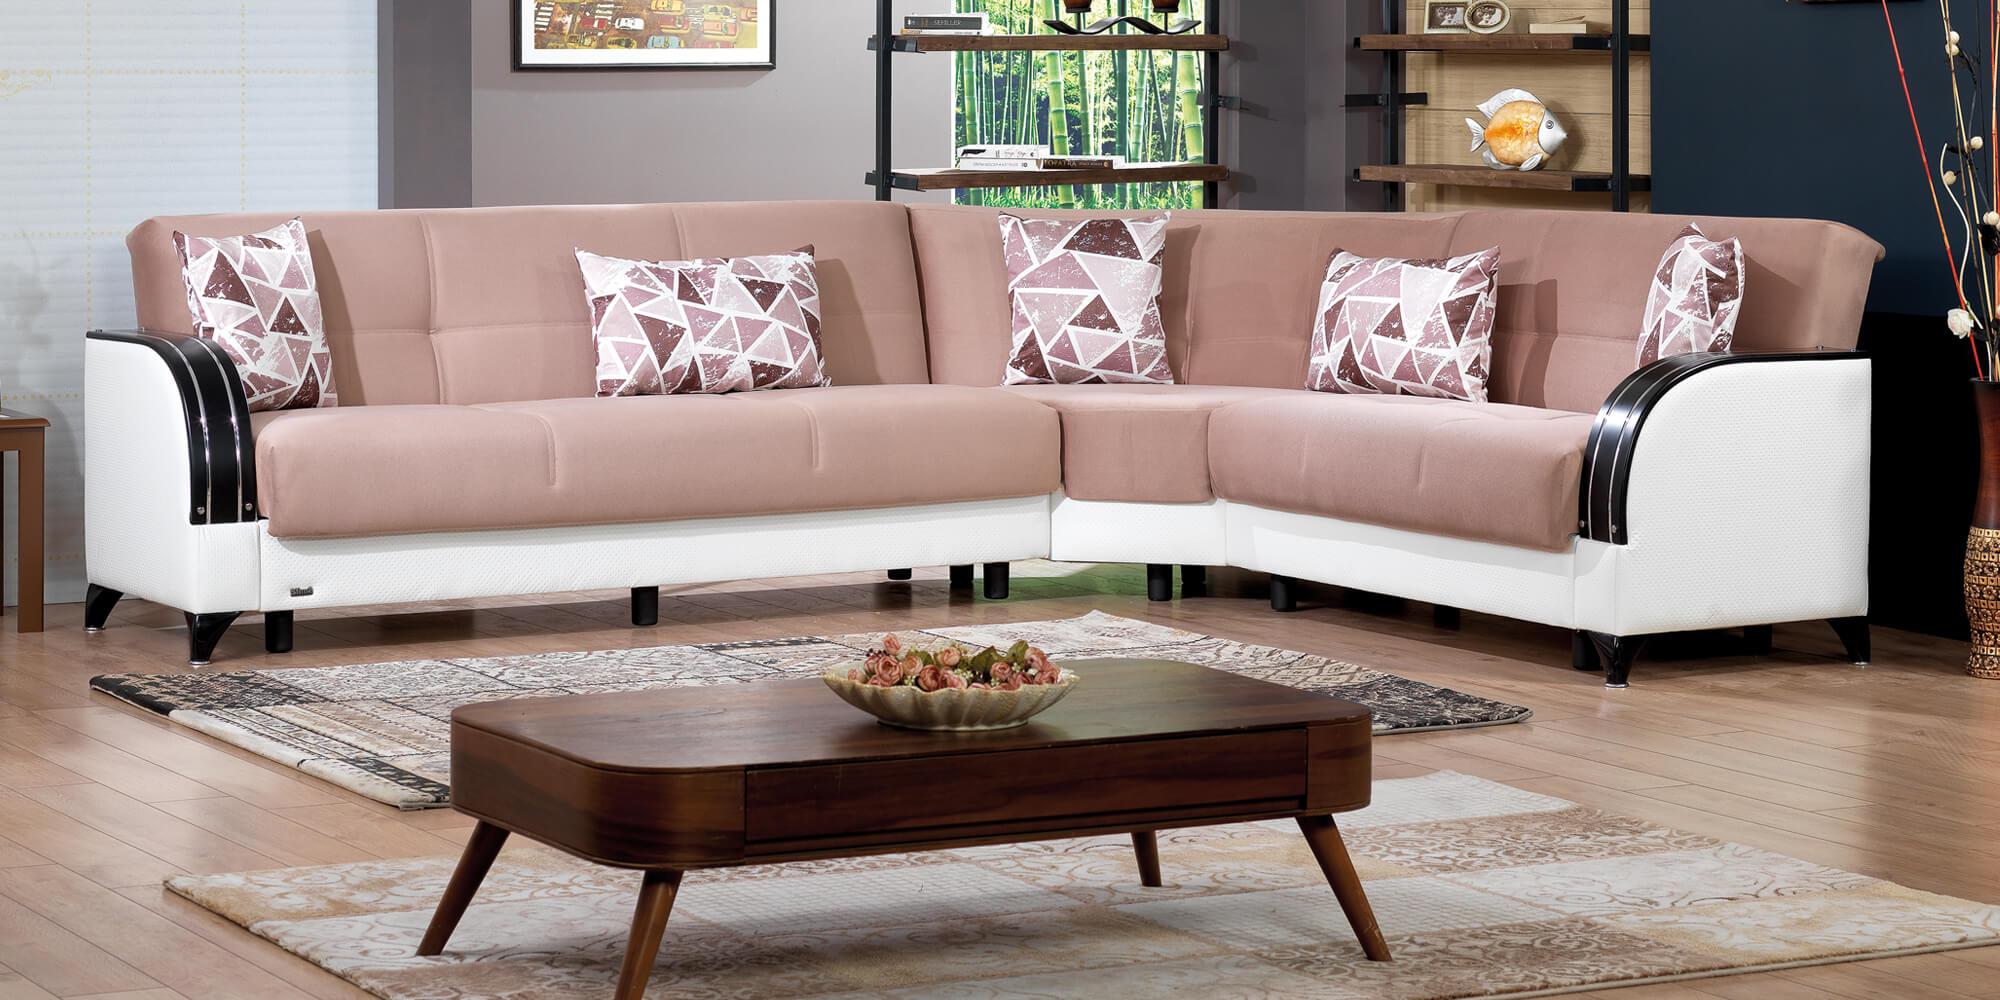 krom sitzecke yuvam m belhaus in wuppertal cilek offizieller h ndler in europa. Black Bedroom Furniture Sets. Home Design Ideas